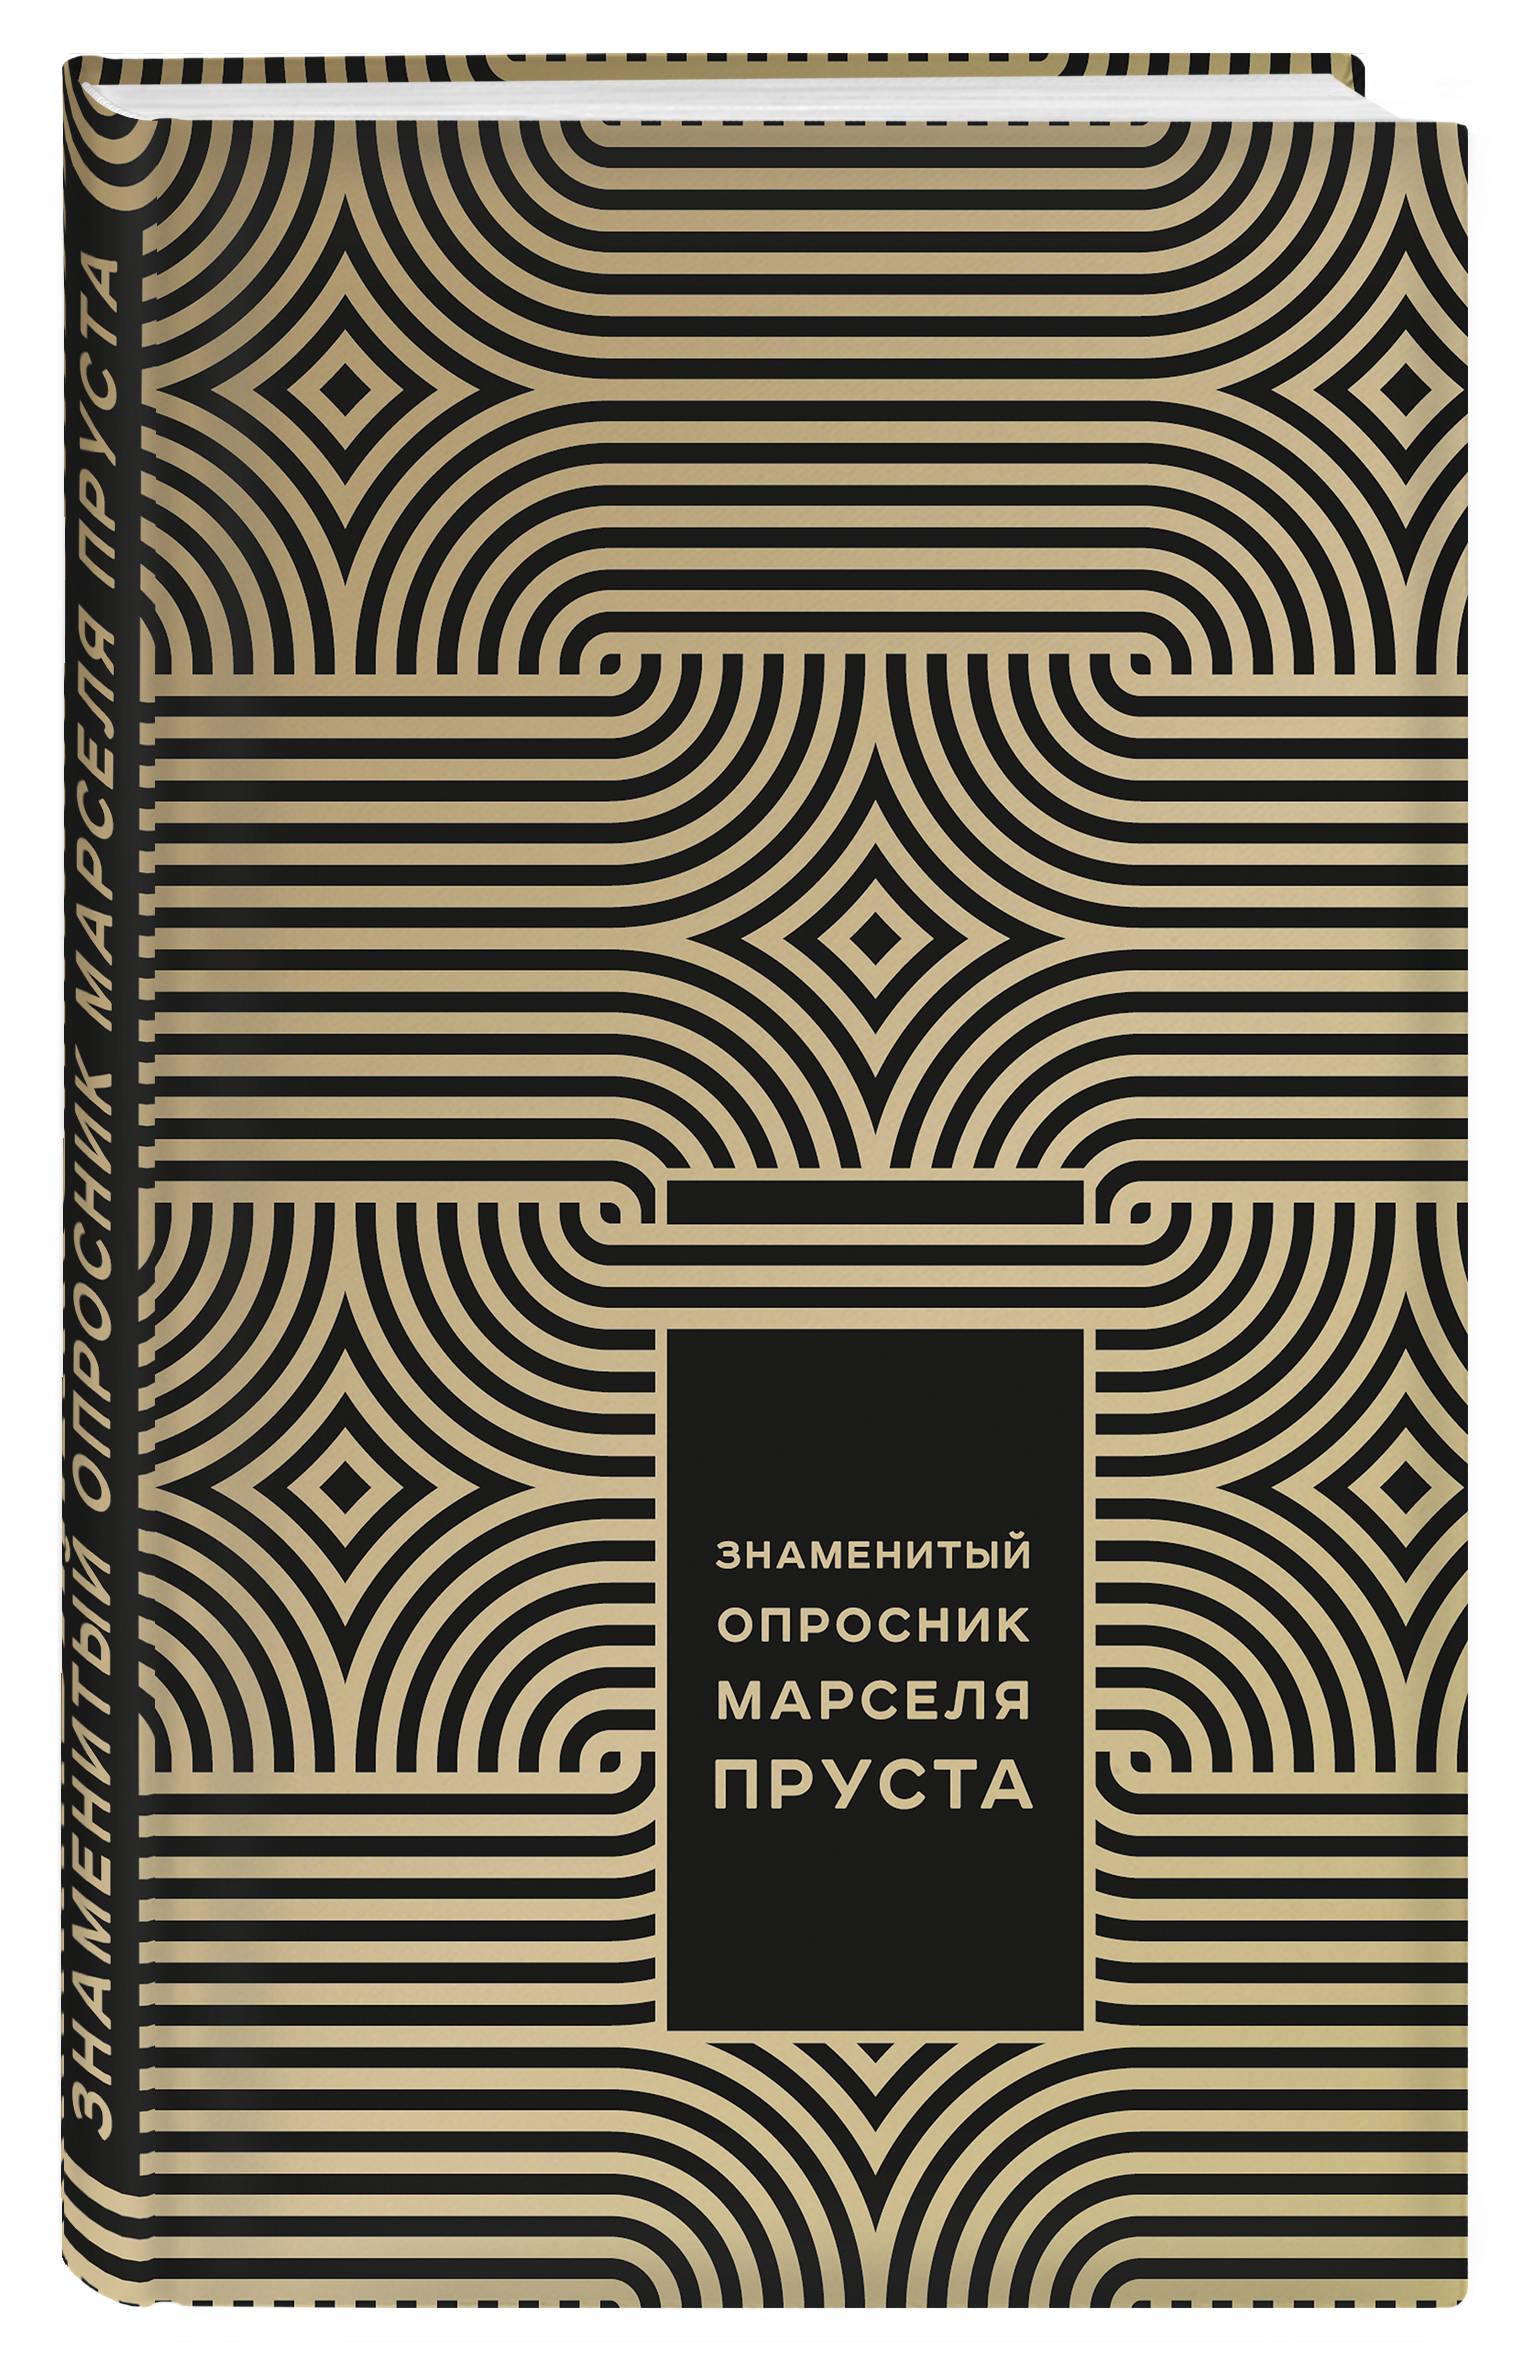 Джоанна Неборски Знаменитый Опросник Марселя Пруста